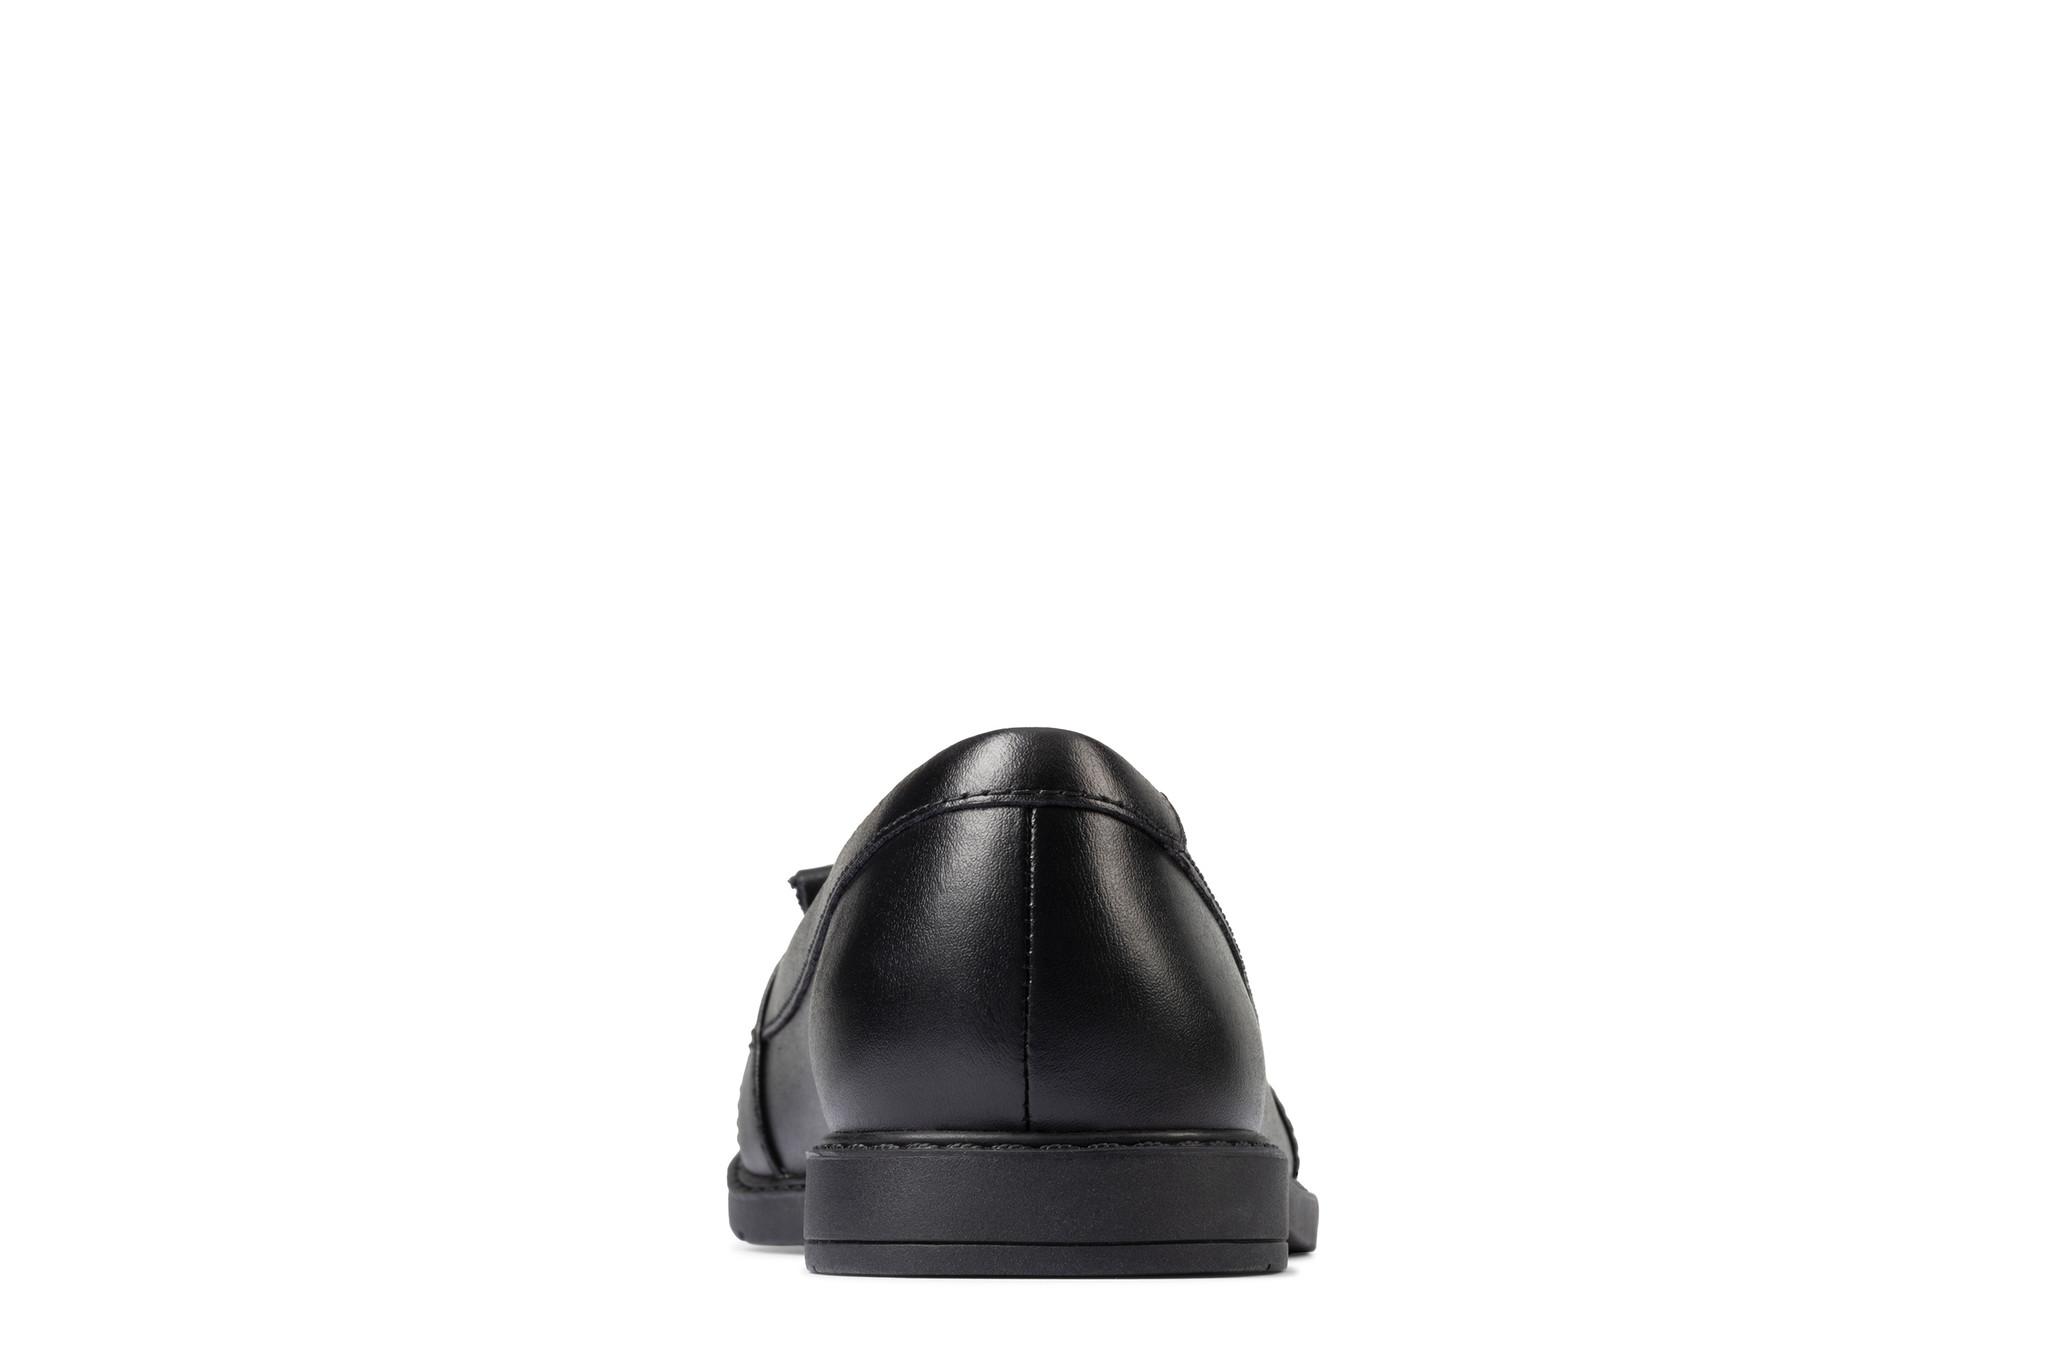 Clarks Scala Bright Black Leather 5.5